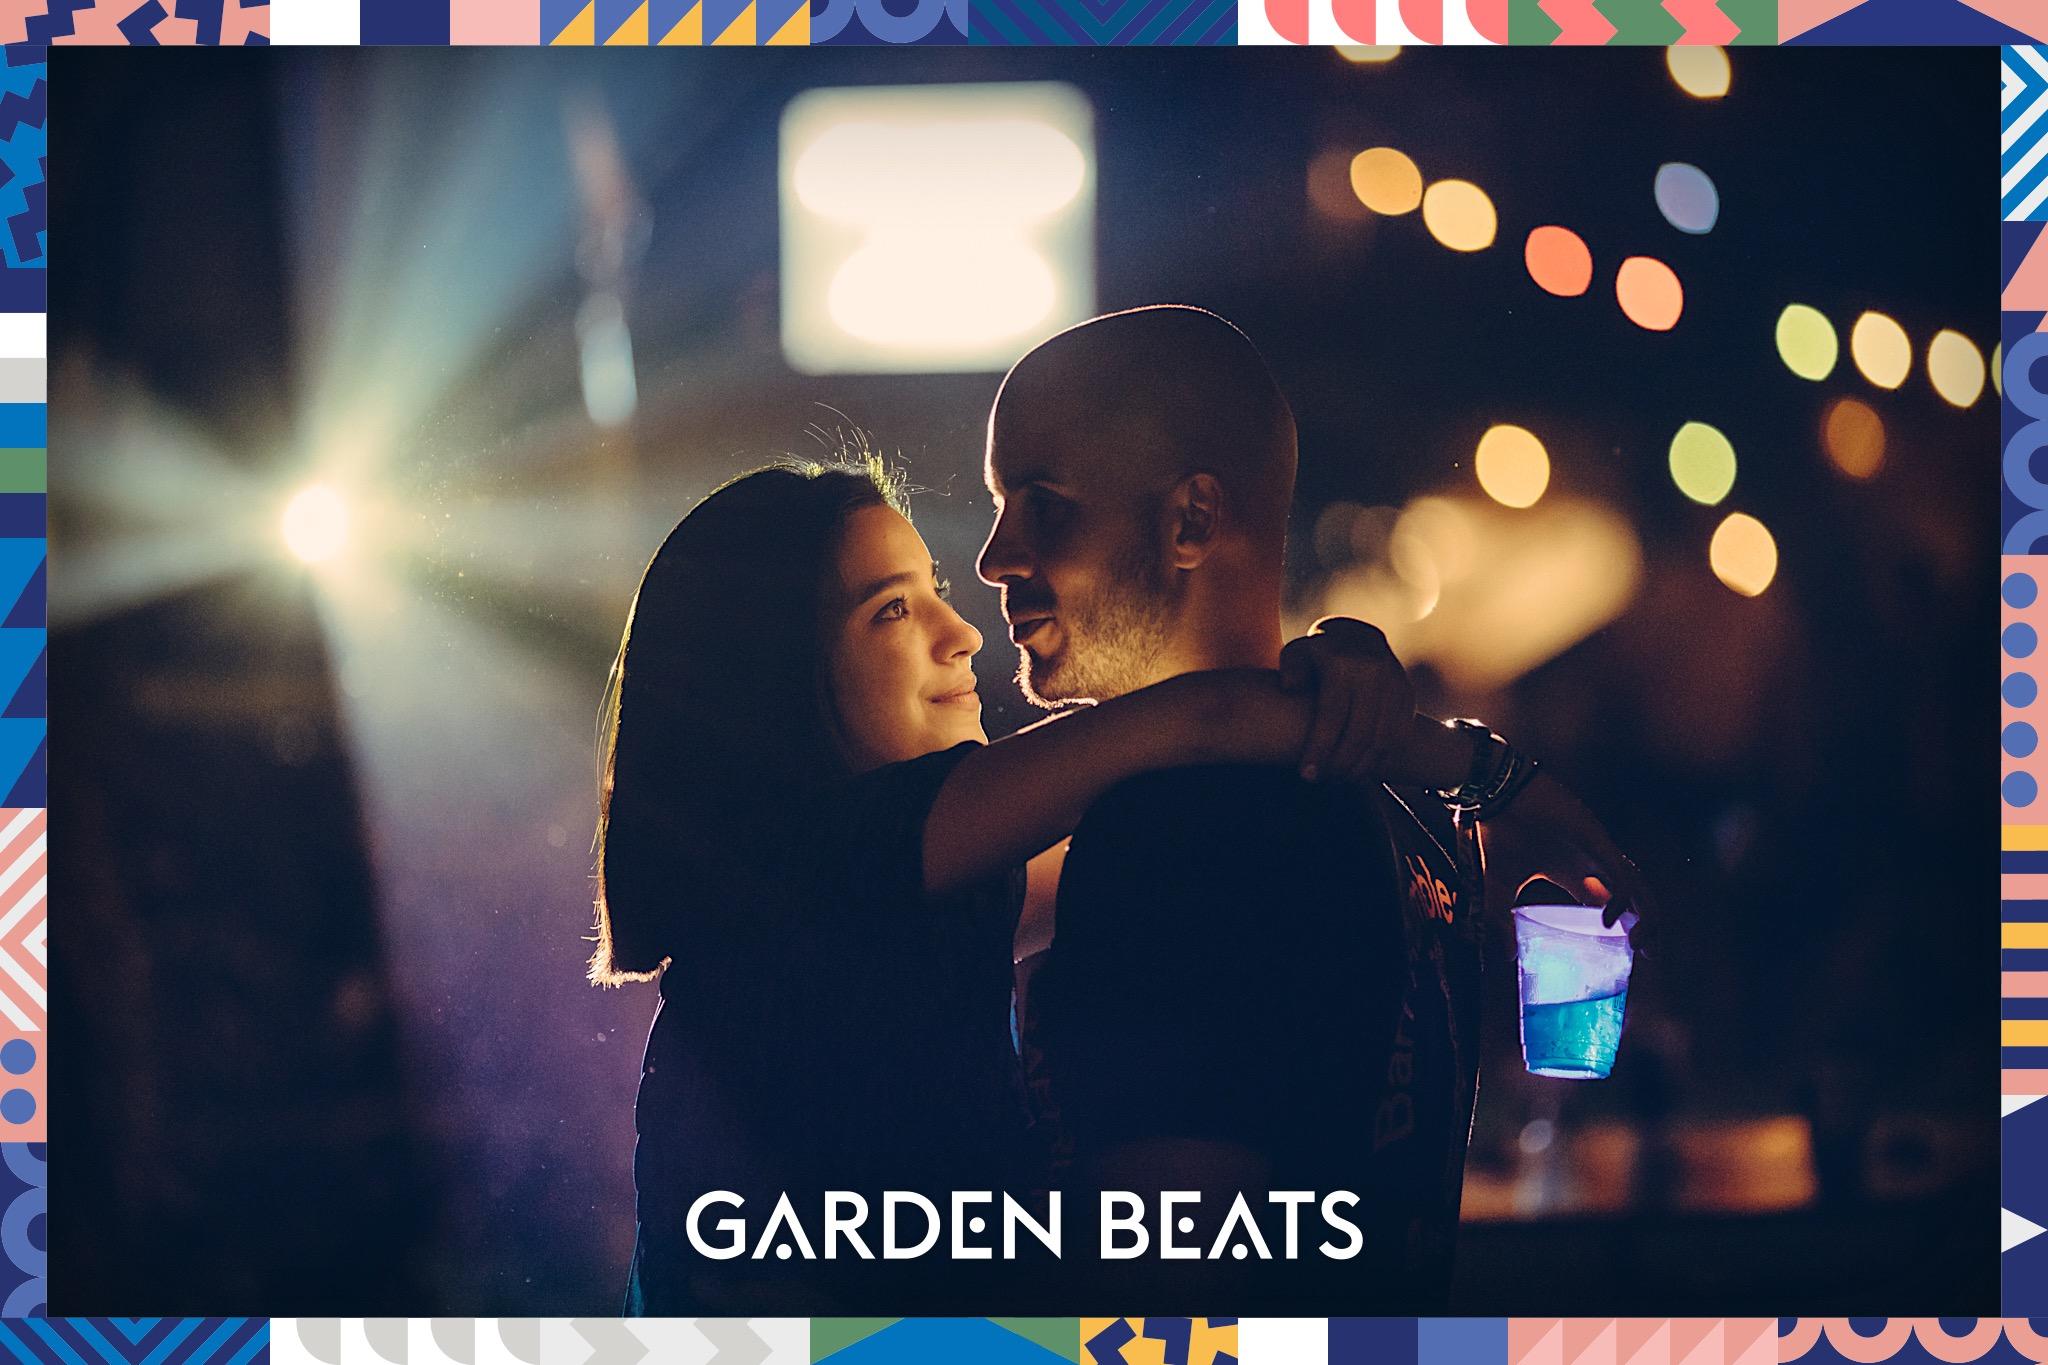 18032017_GardenBeats_Colossal837_WatermarkedGB.jpg